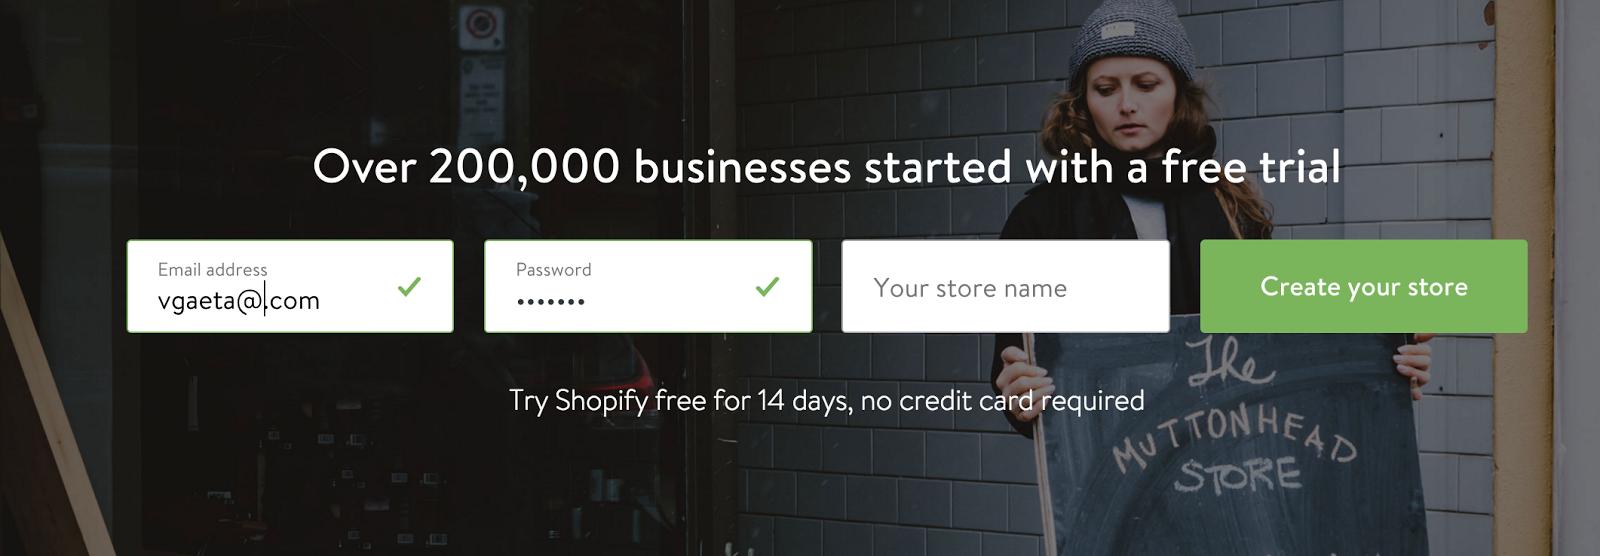 Shopify-clean-form-labels.png